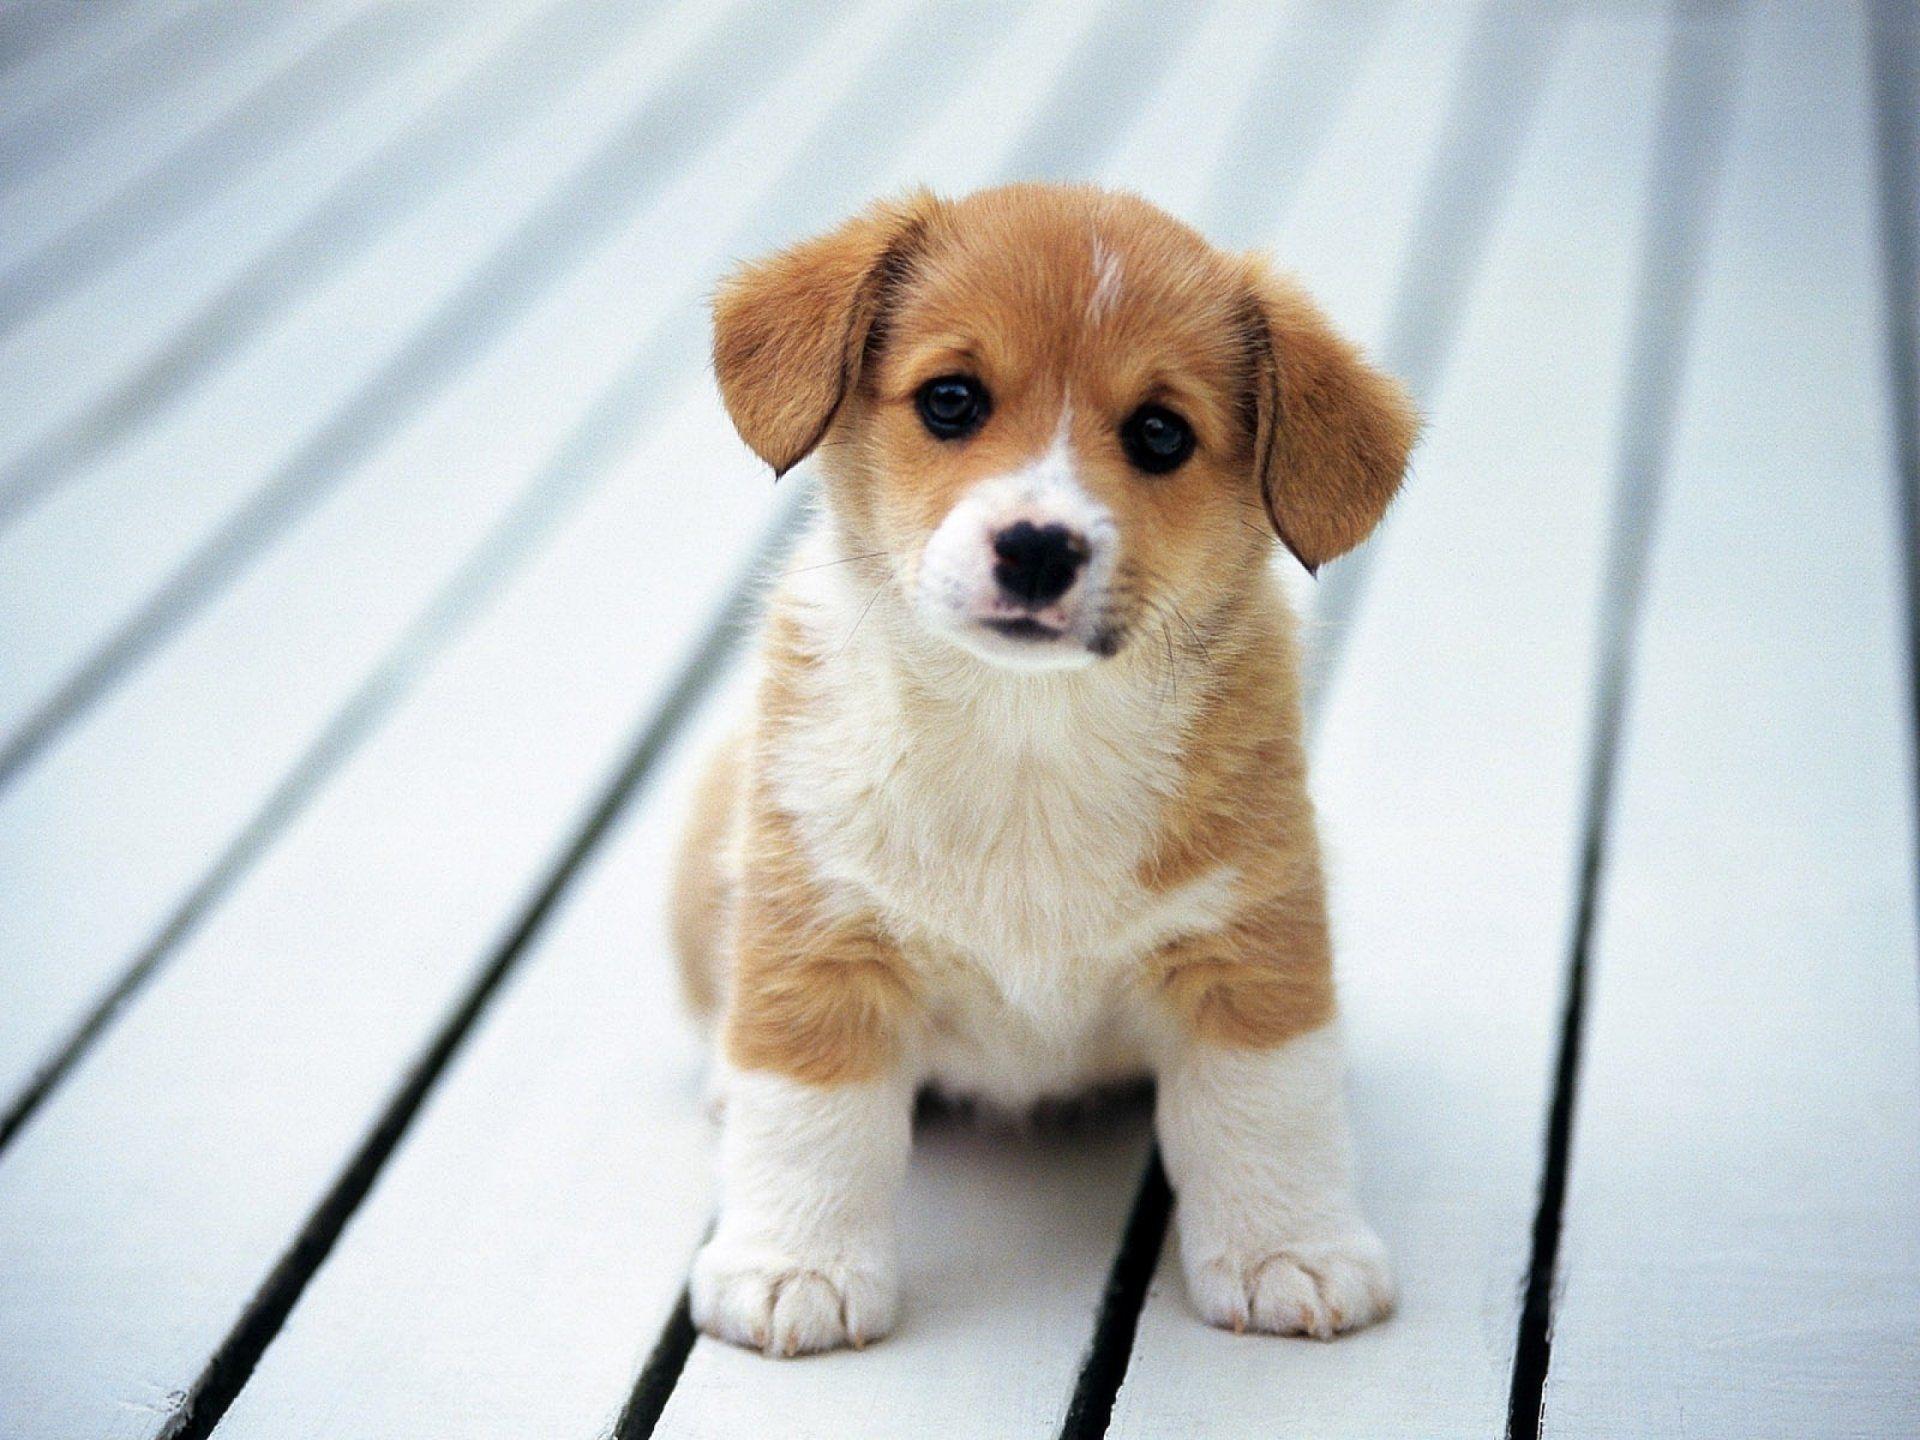 Pet Wallpapers   Top Pet Backgrounds   WallpaperAccess 1920x1440